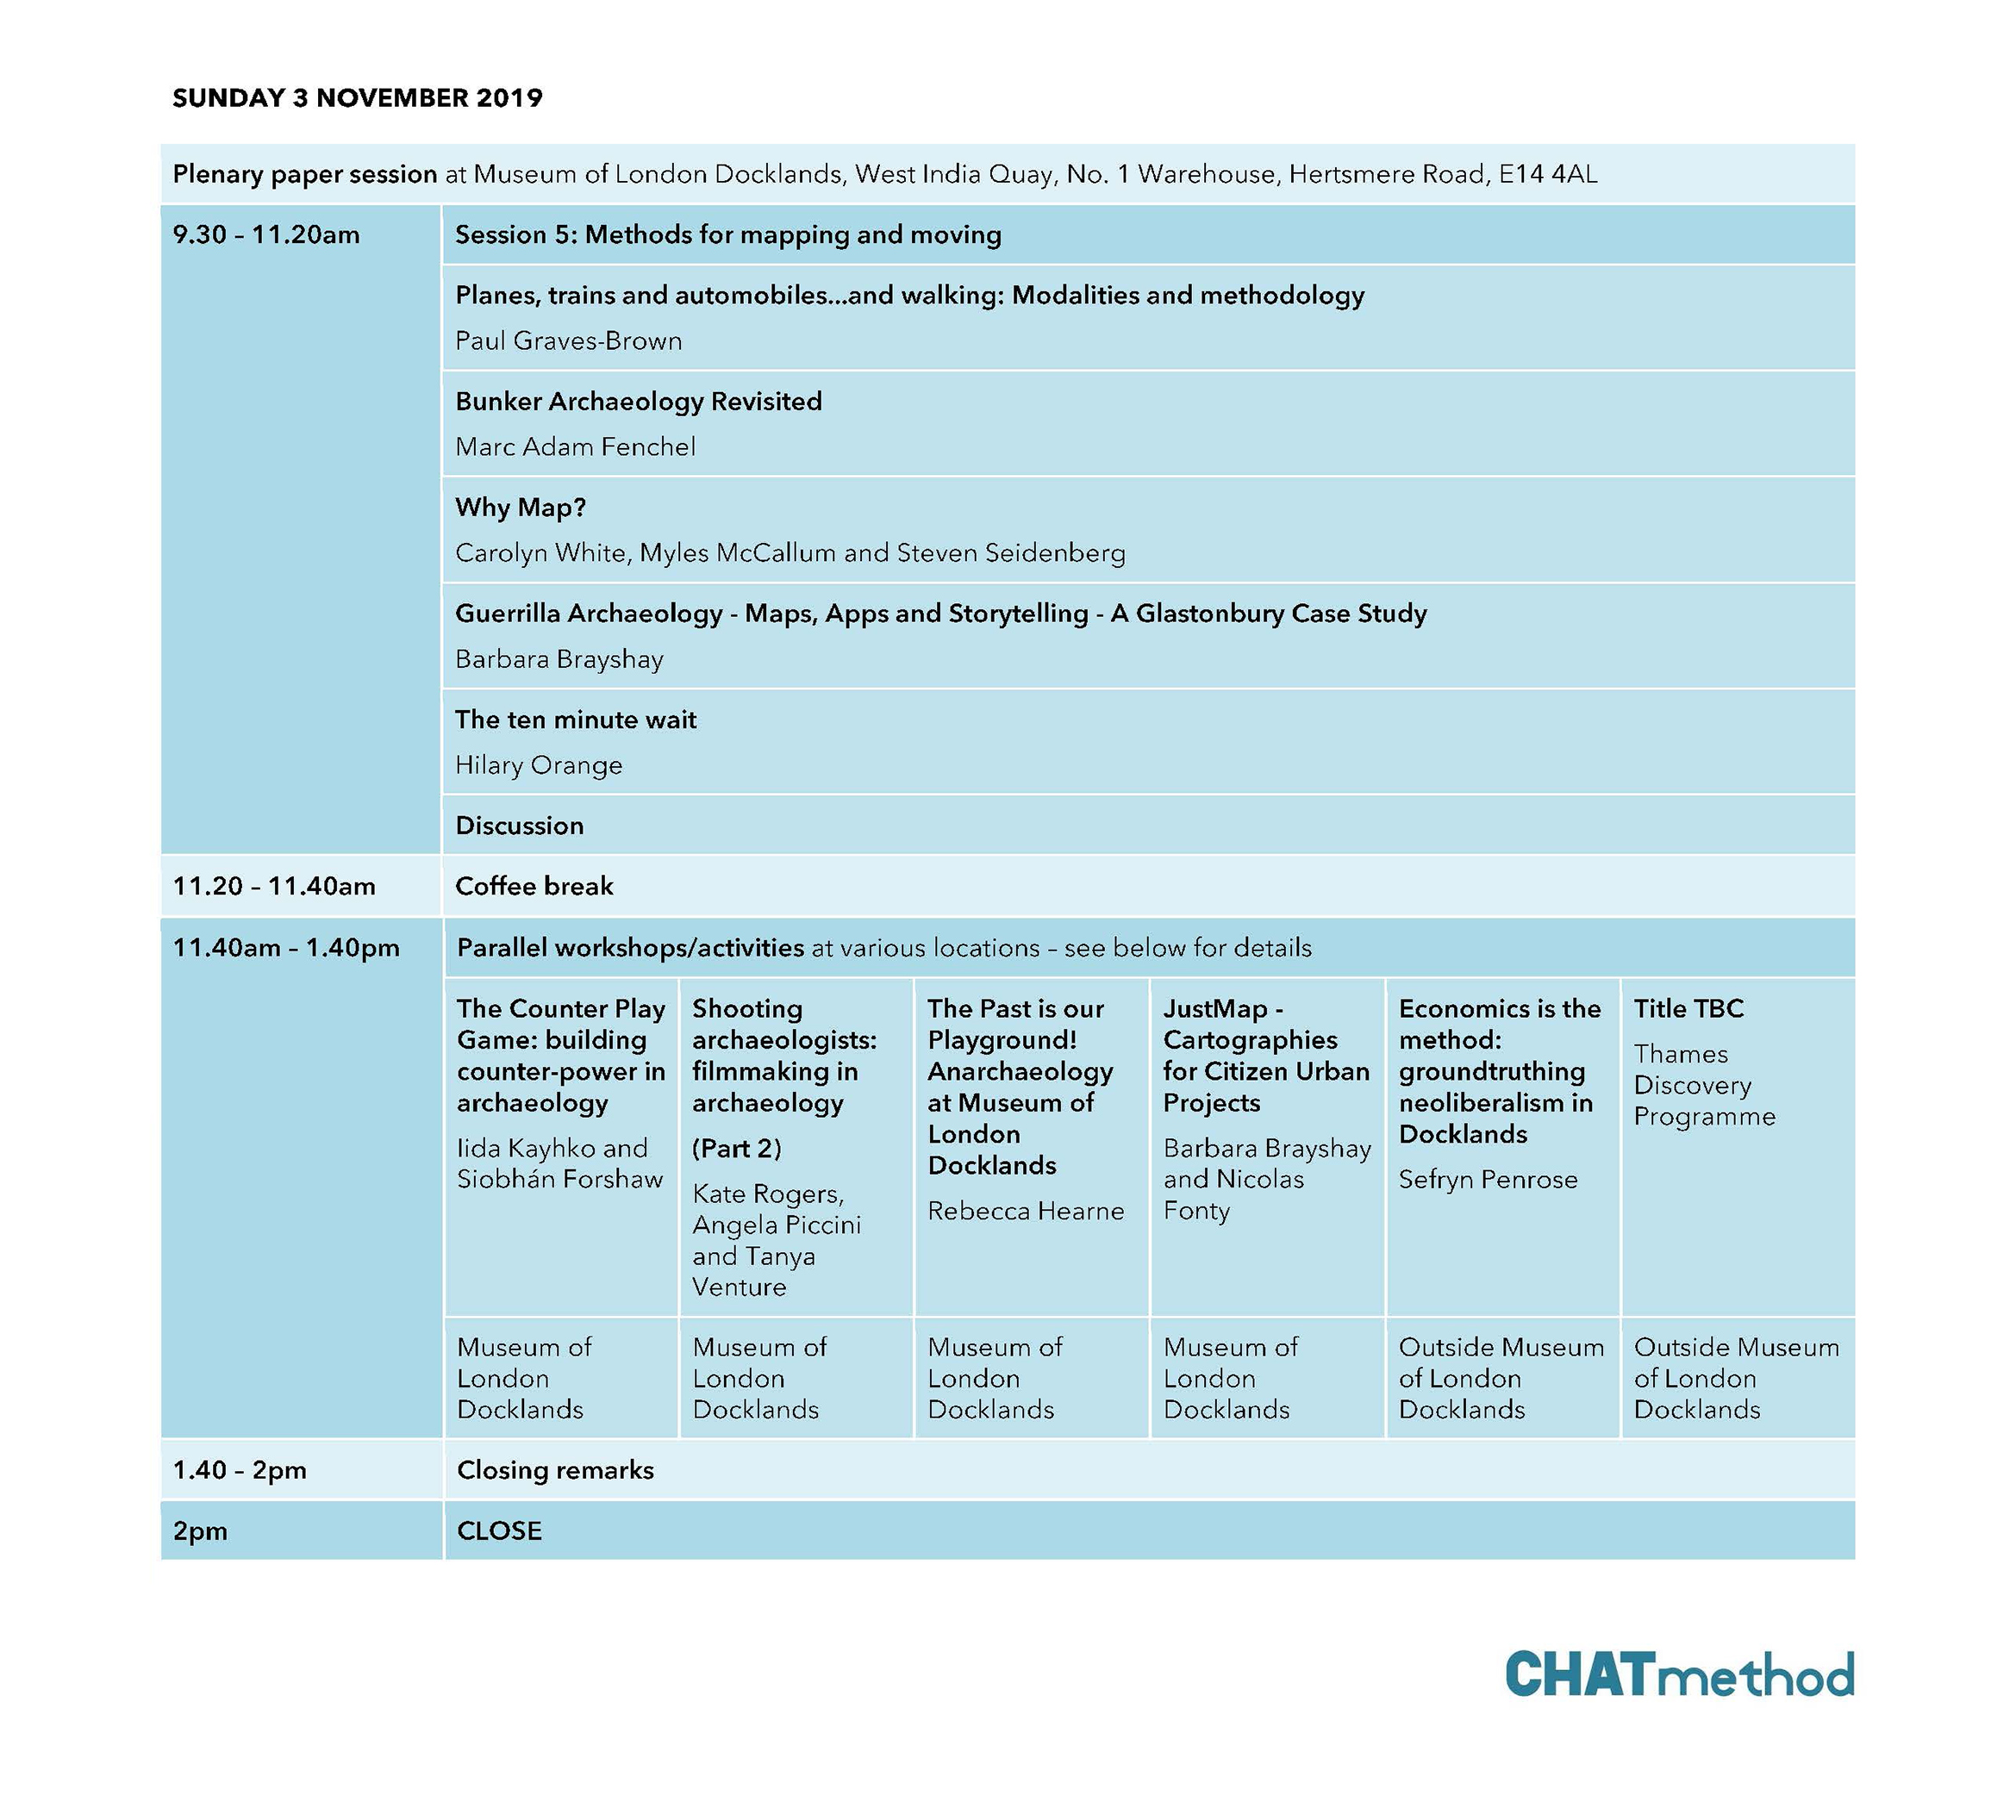 CHATmethod provisional timetable - Day 3